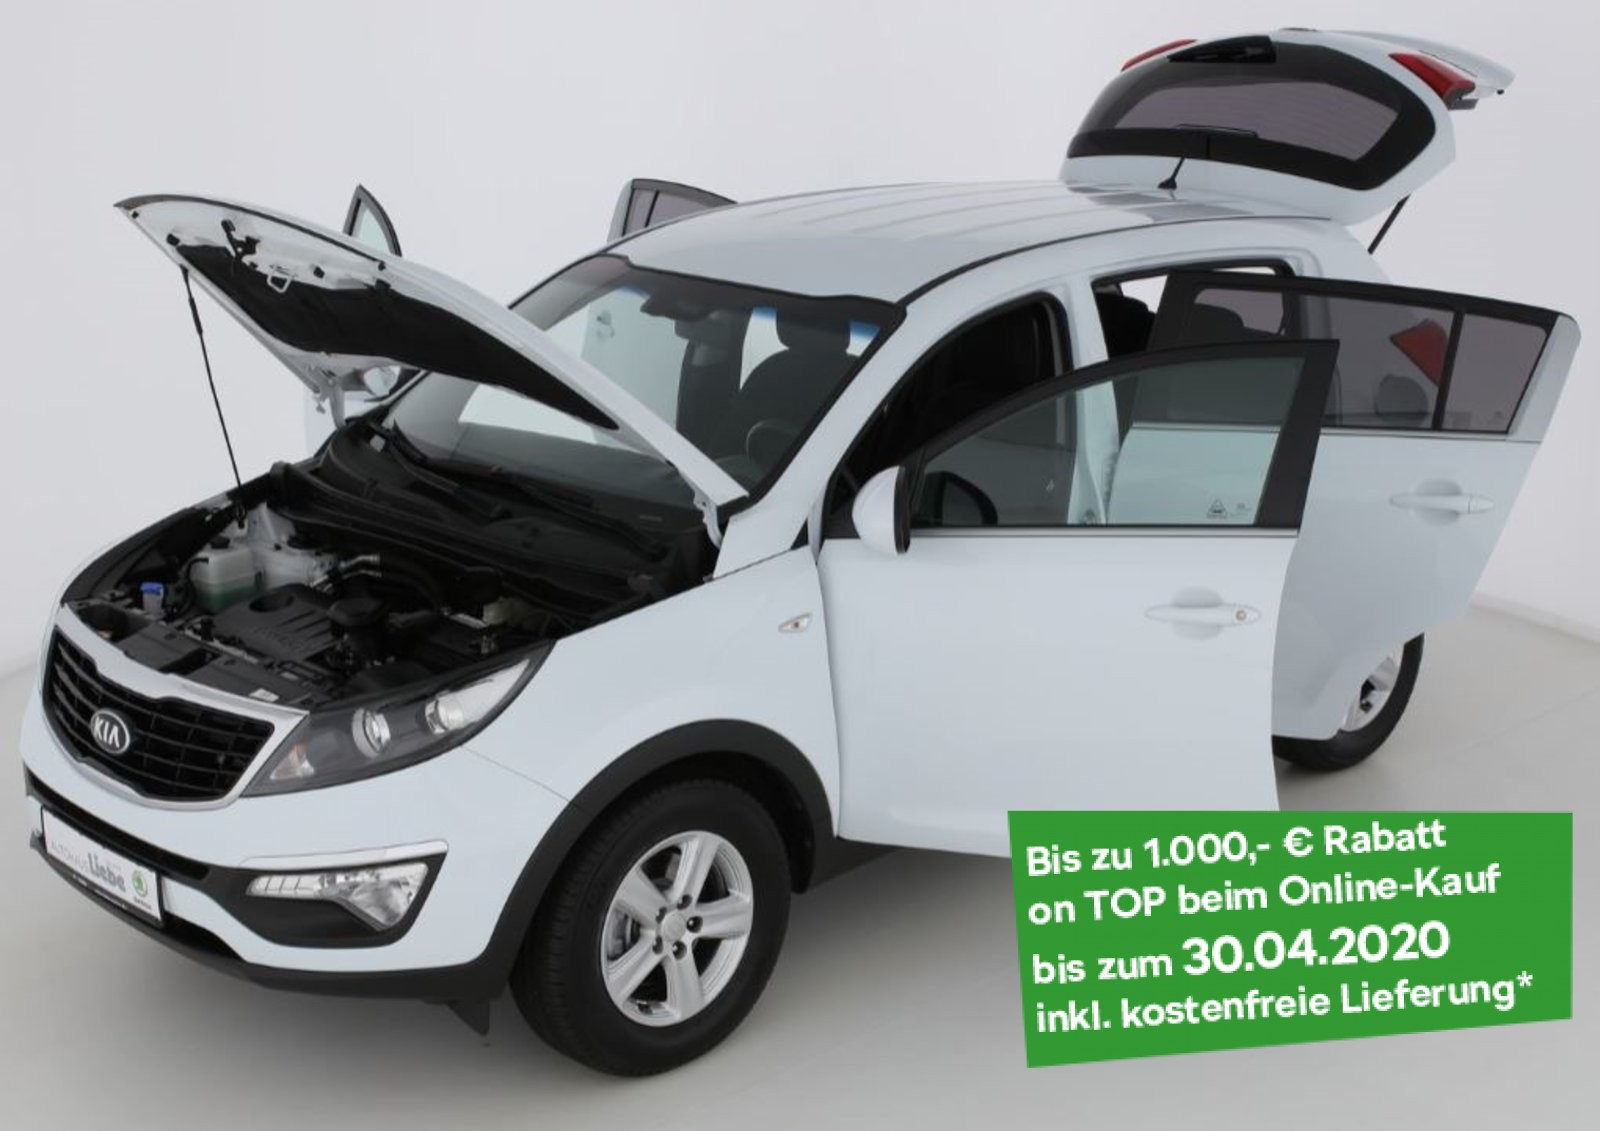 Kia SPORTAGE 2WD KLIMA ISOFIX TEMPOMAT FREISPRECHuvm, Jahr 2015, Diesel